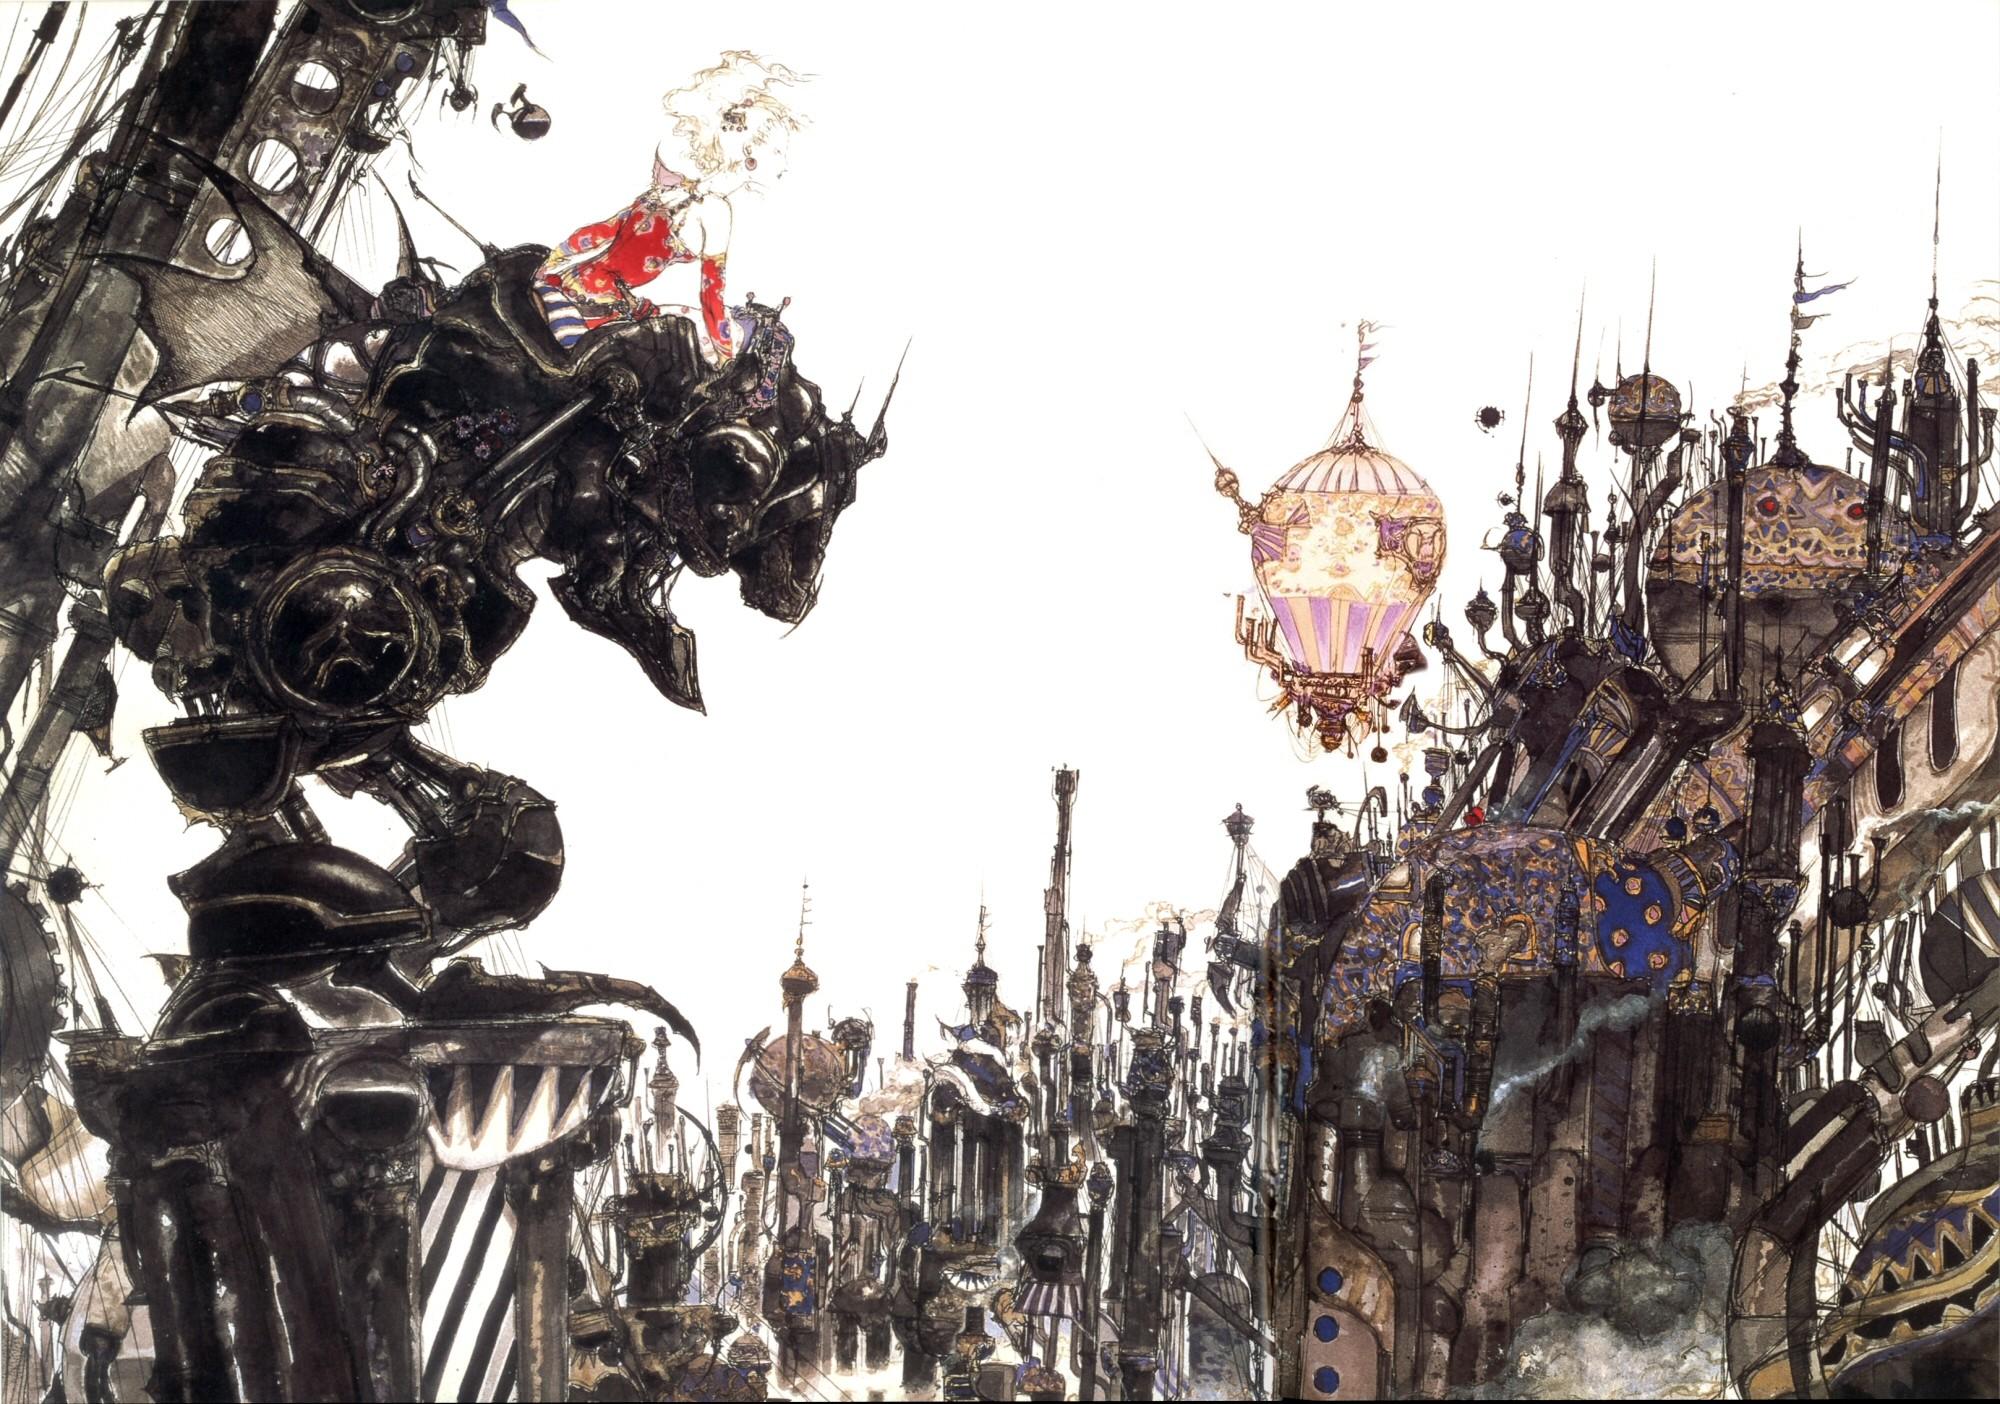 Explore Final Fantasy Artwork, Final Fantasy Vi, and more!